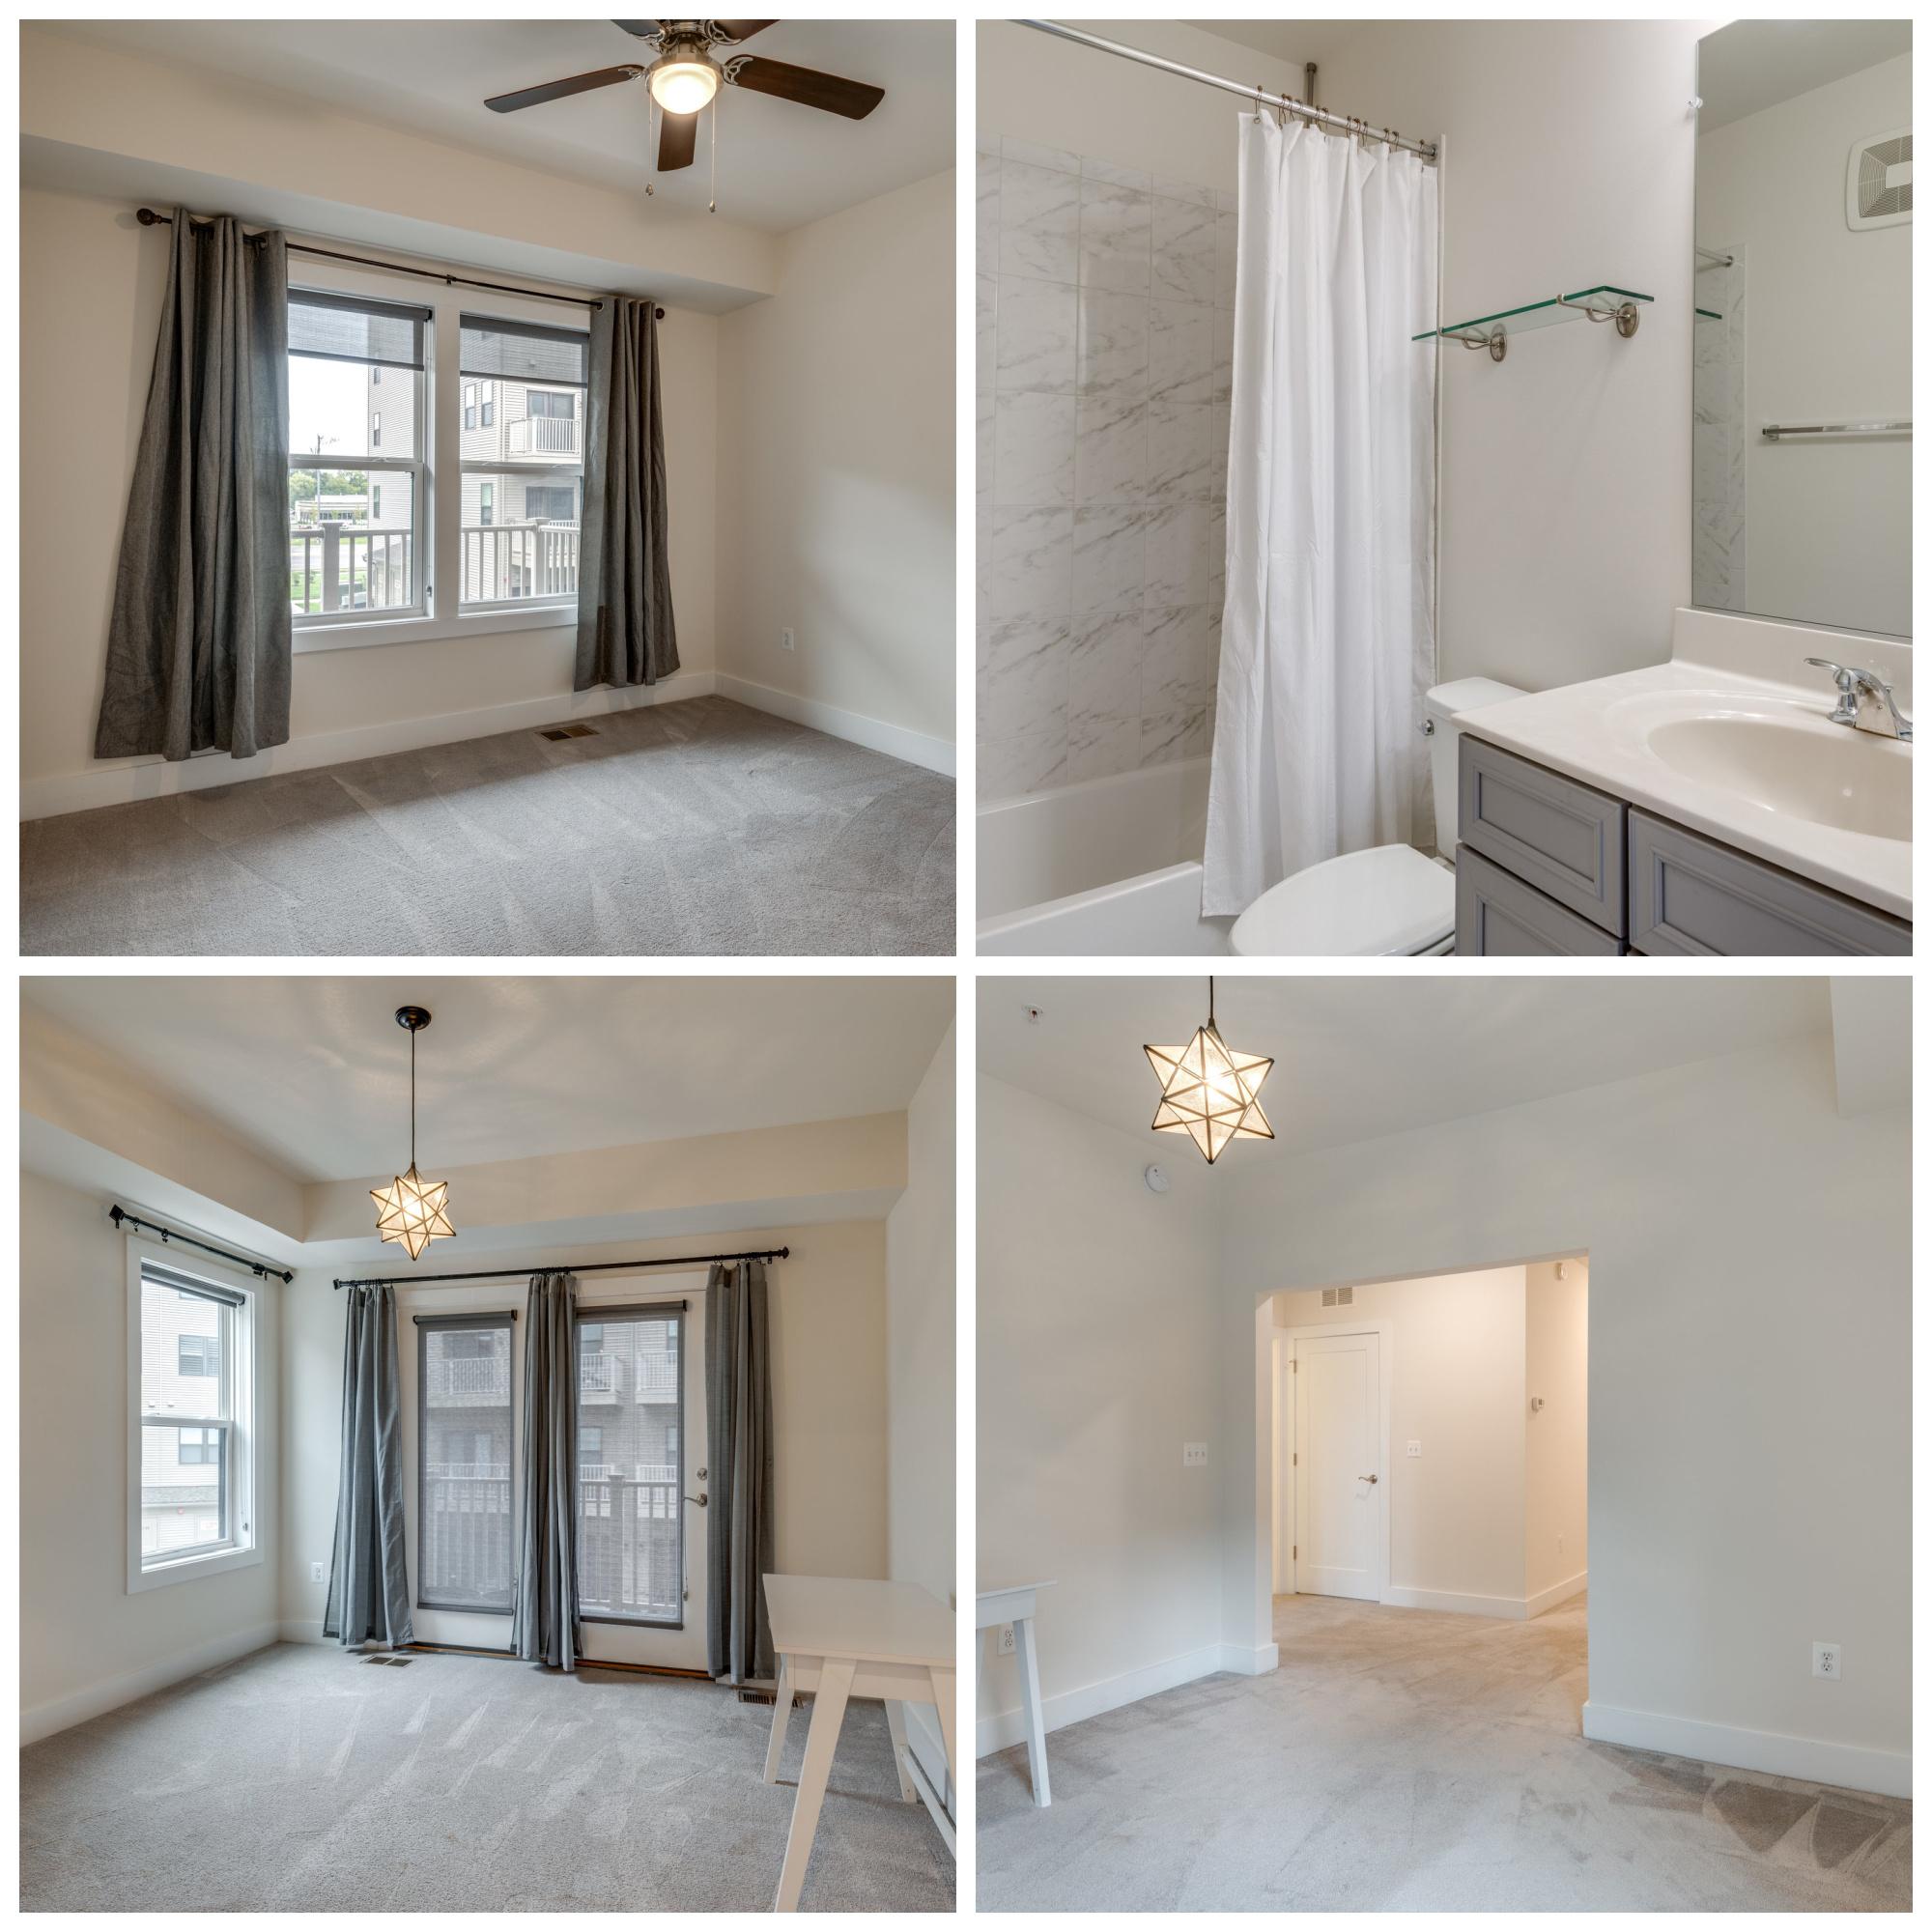 20488 Milbridge Ter, Ashburn- Additional Bedroom, Bathroom, and Den